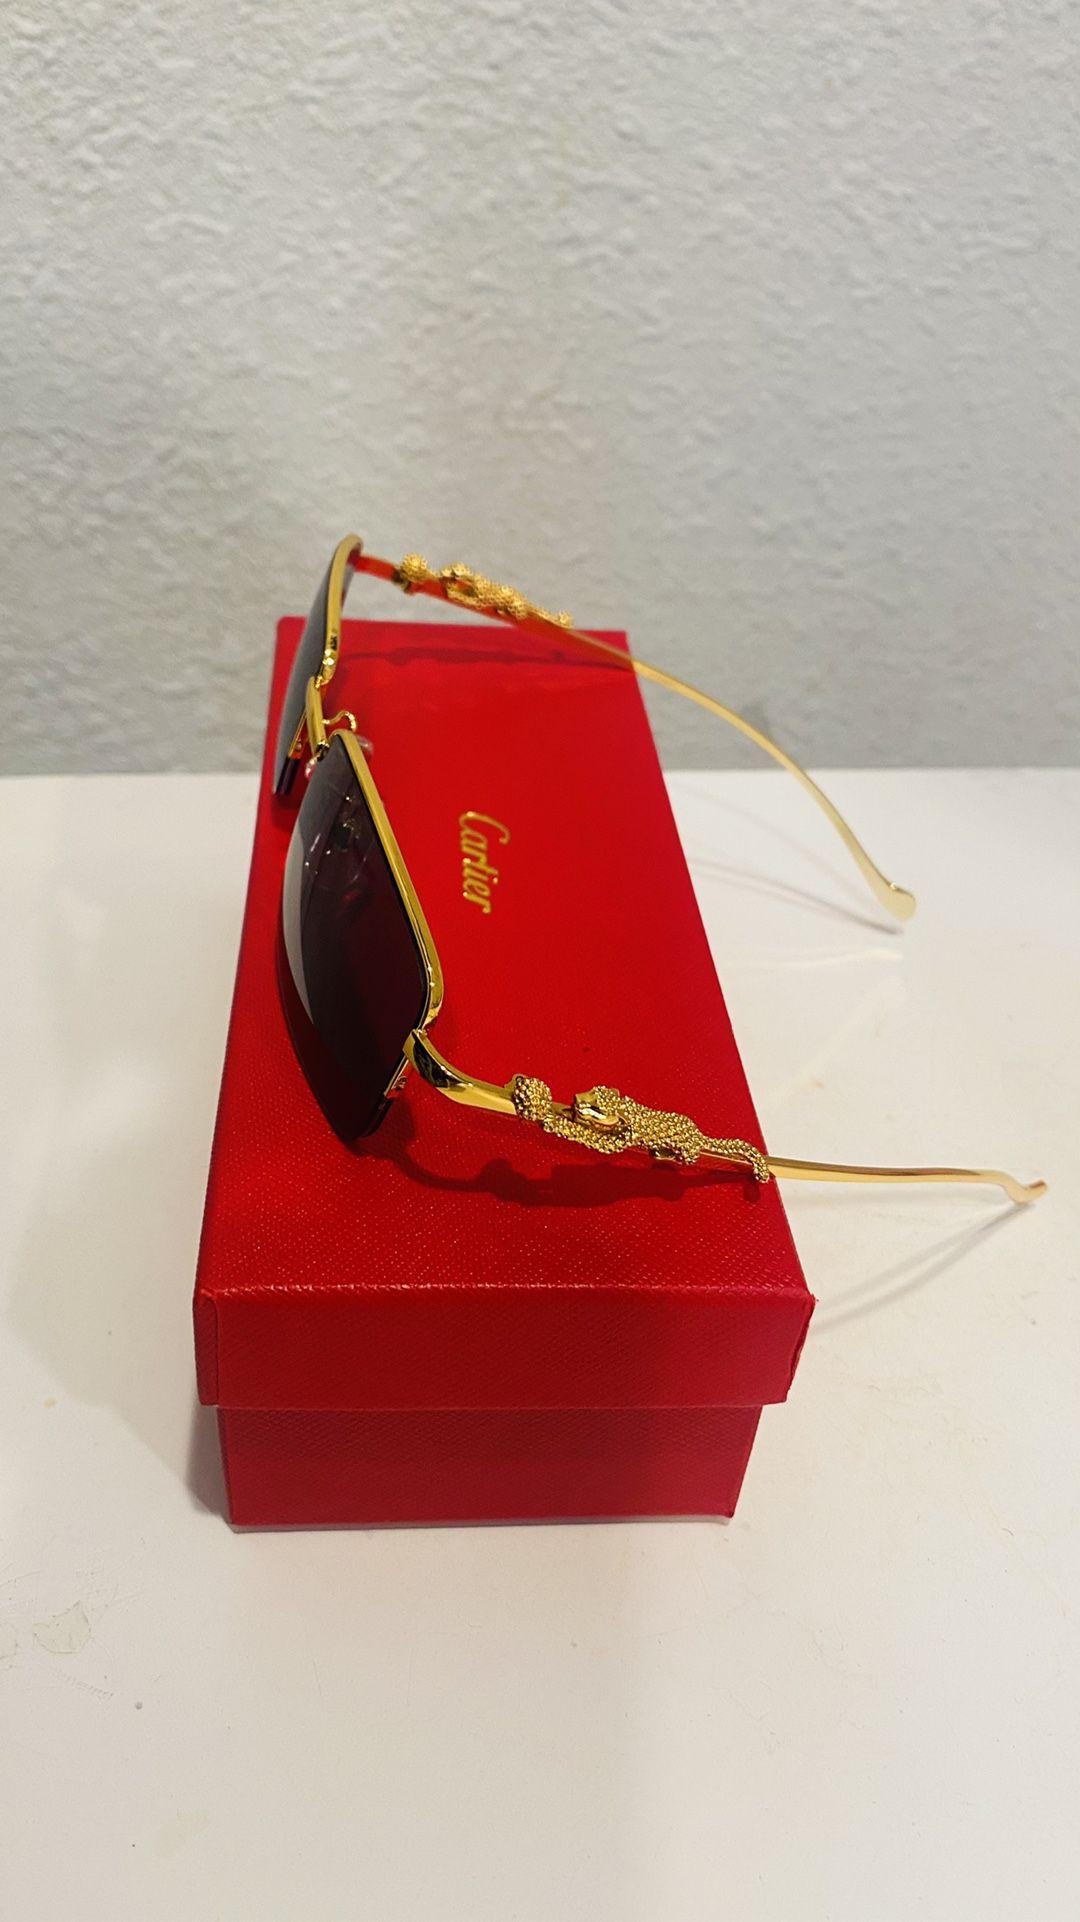 Cartier Brown sunglasses